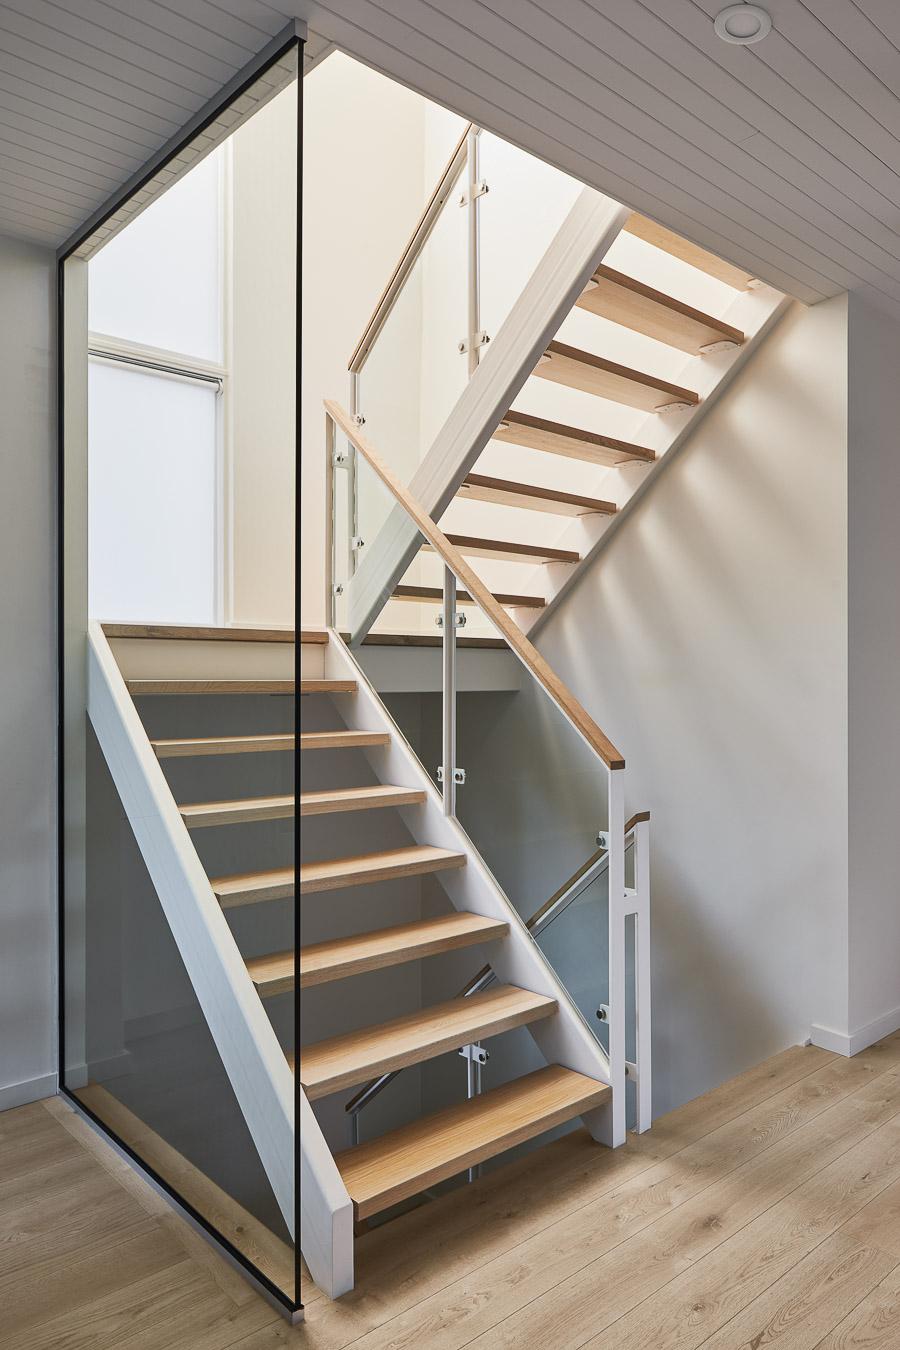 032-Shean Architects Fentiman.jpg